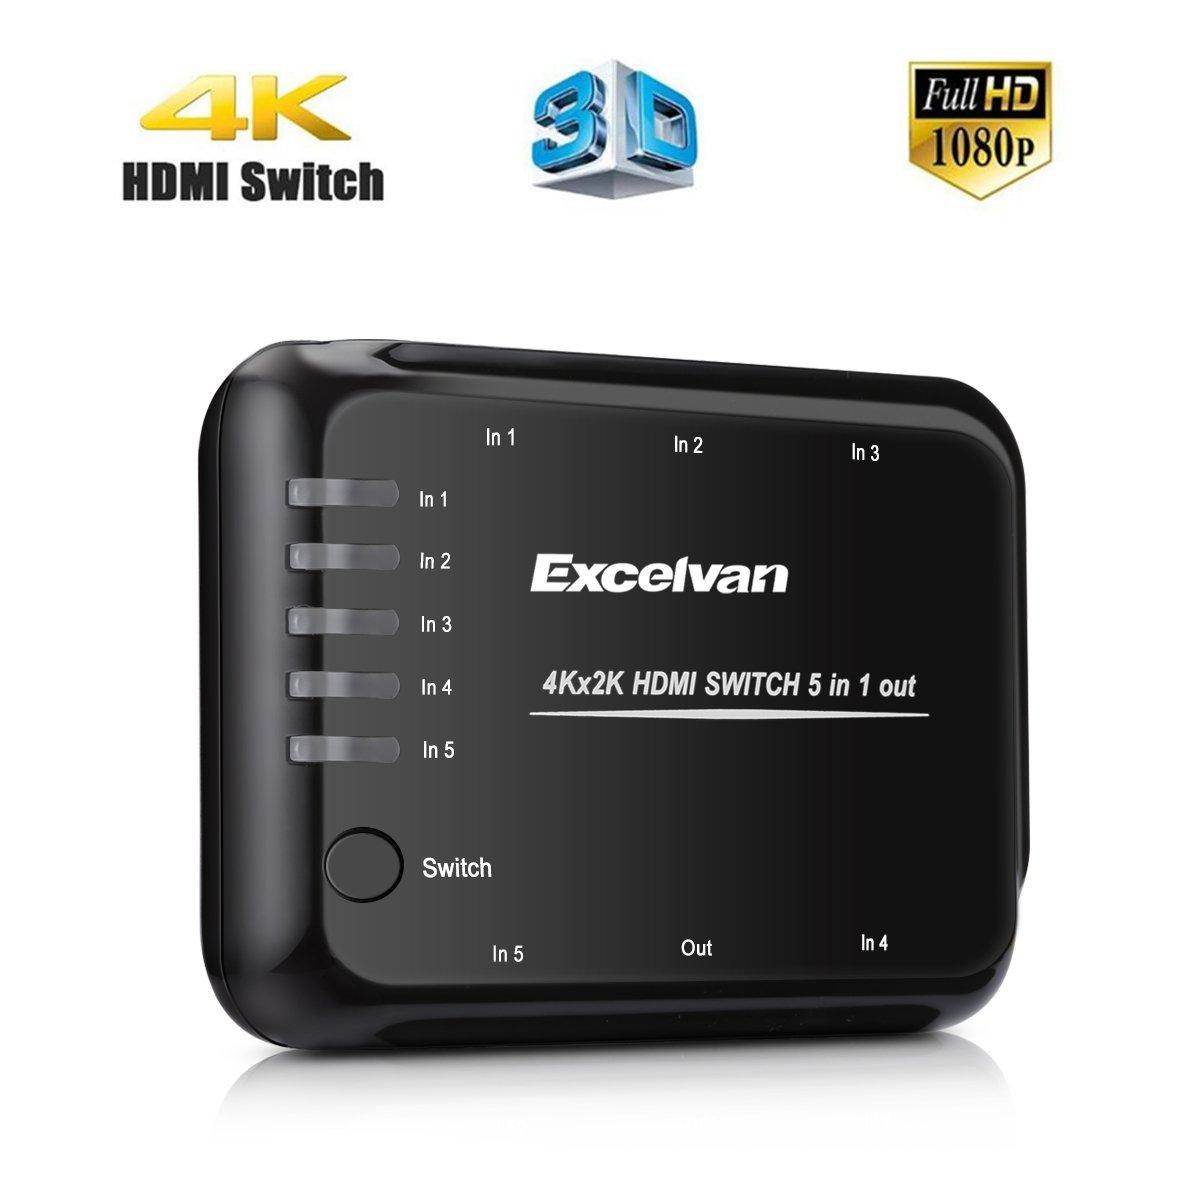 Excelvan VK-TC06 - Mini 4K HDMI Switch 5 Port: Amazon.de: Elektronik